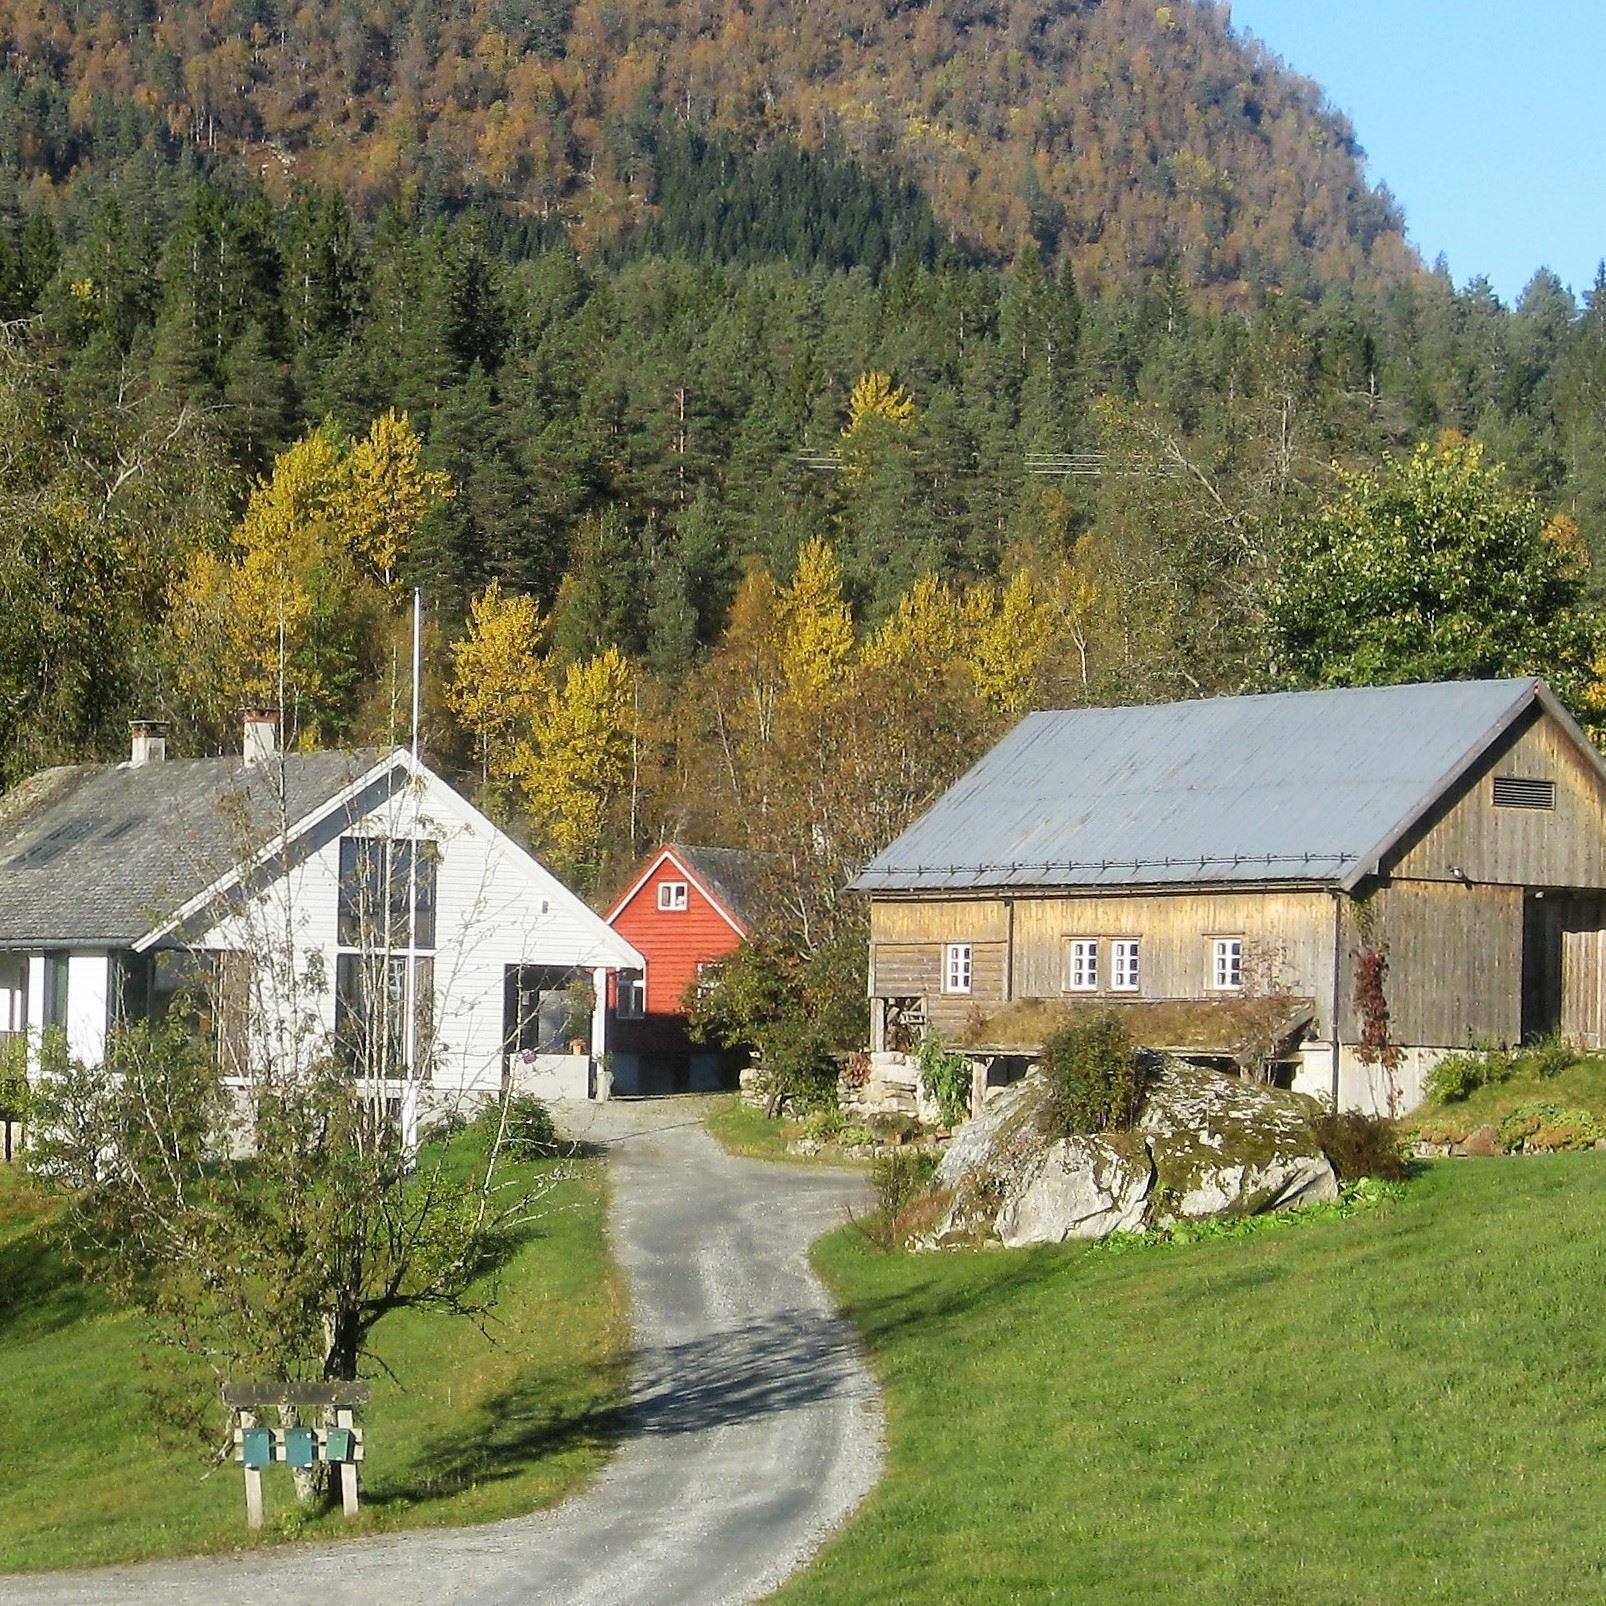 Fjordamattunet - kurs og oppleving